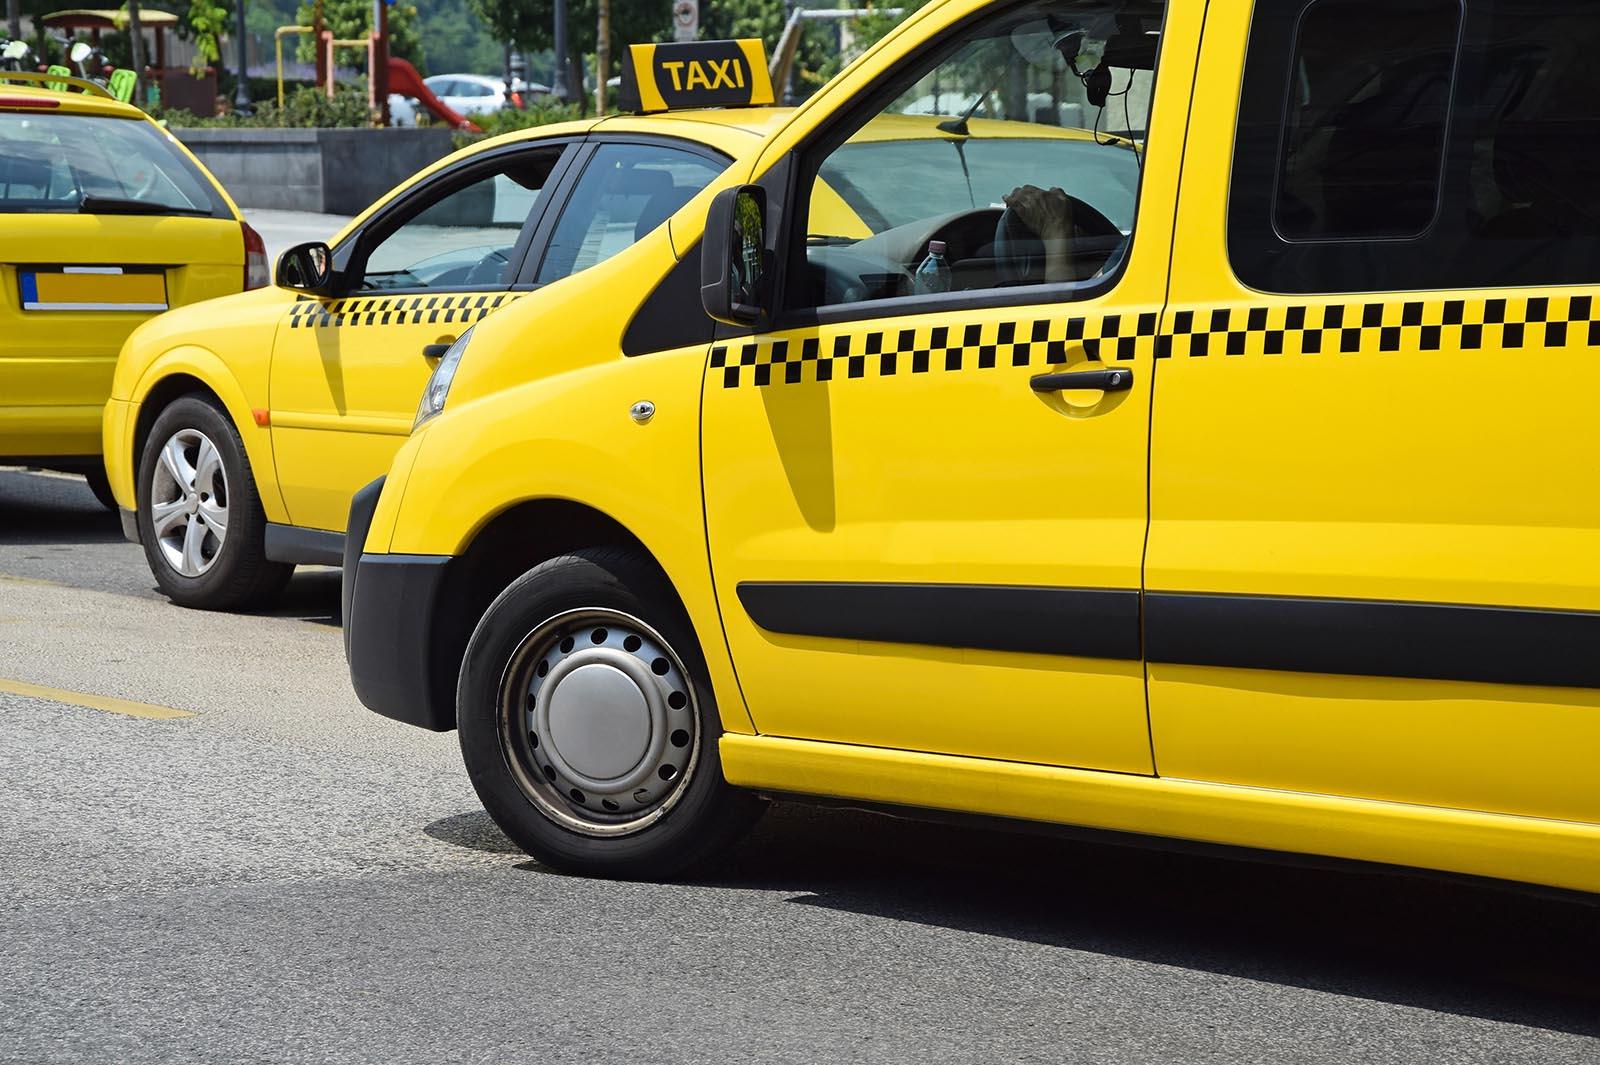 Devis assurance taxi